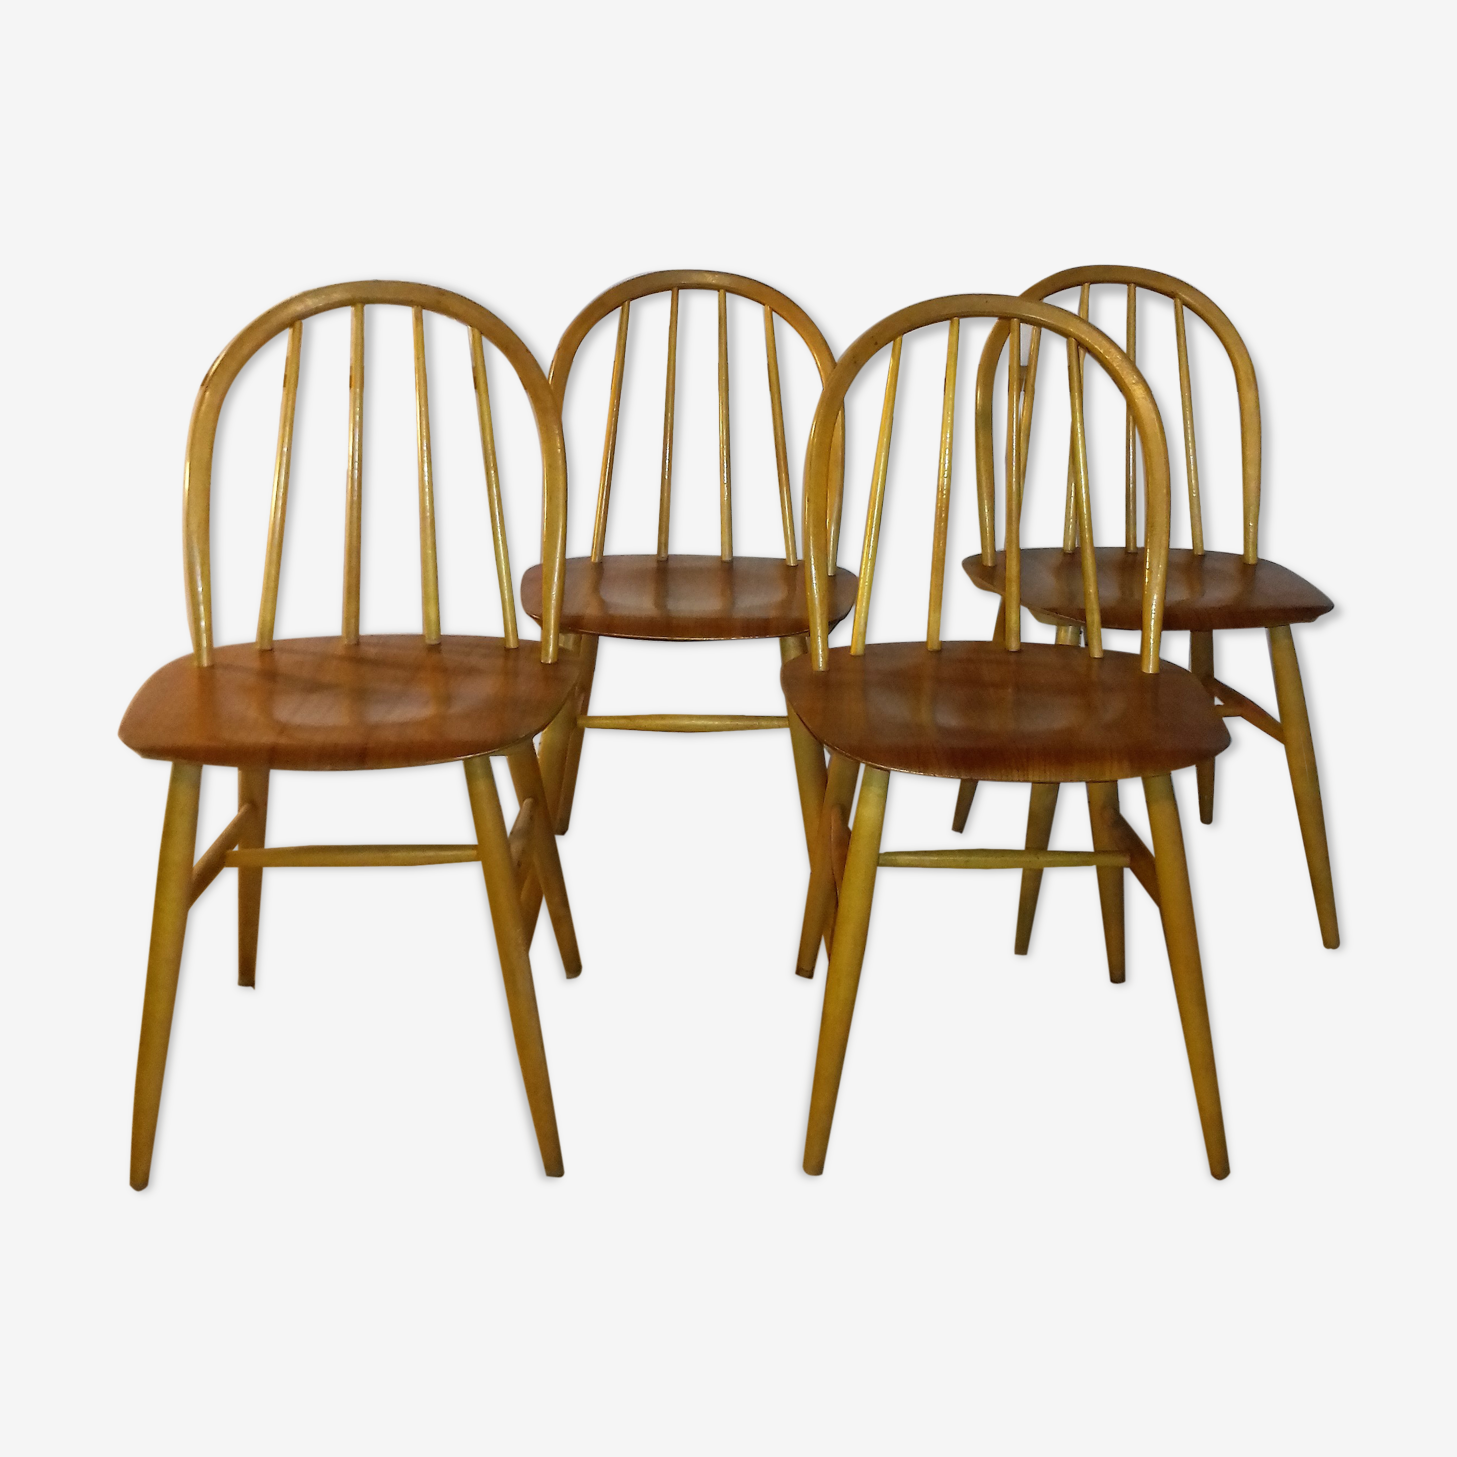 "Set de 4 chaises modèle ""fanett"" design Ilmari Tapiovaara 1959"